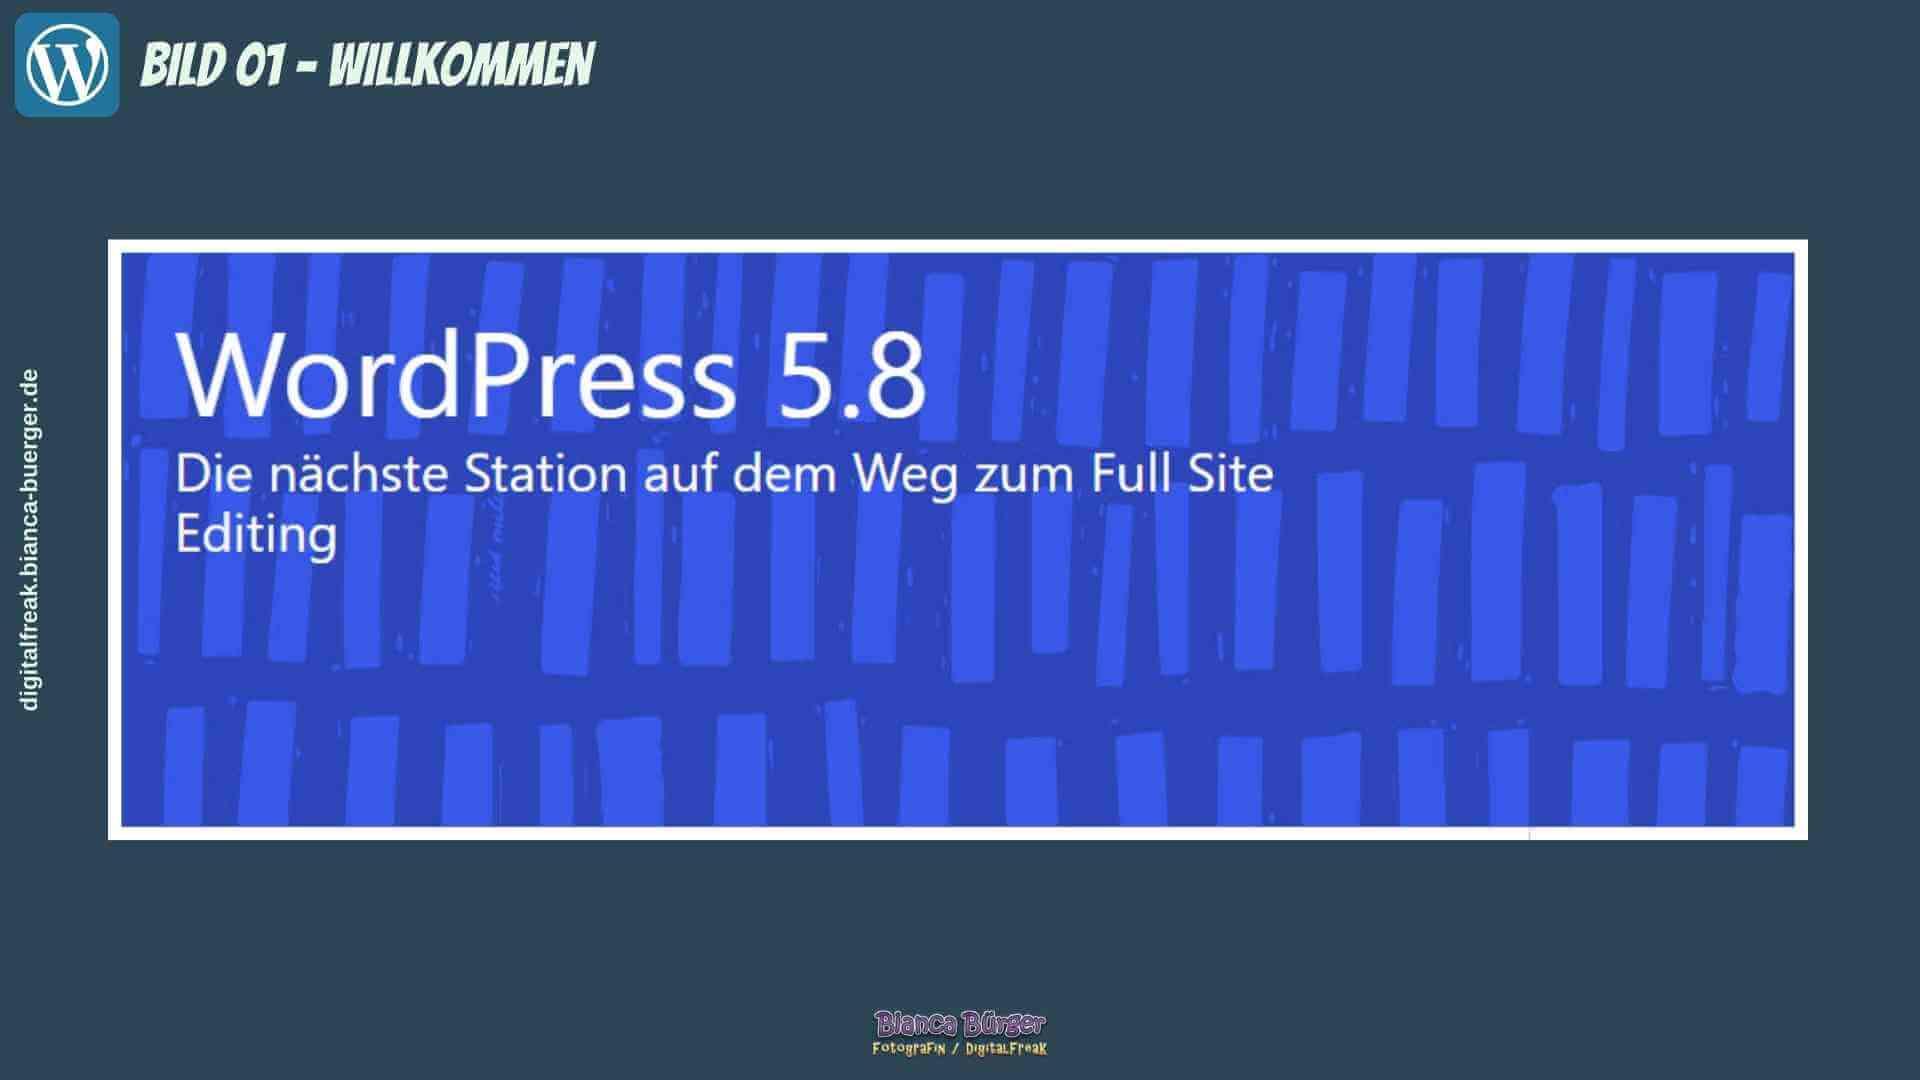 WordPress-5-8_01_Willkommen